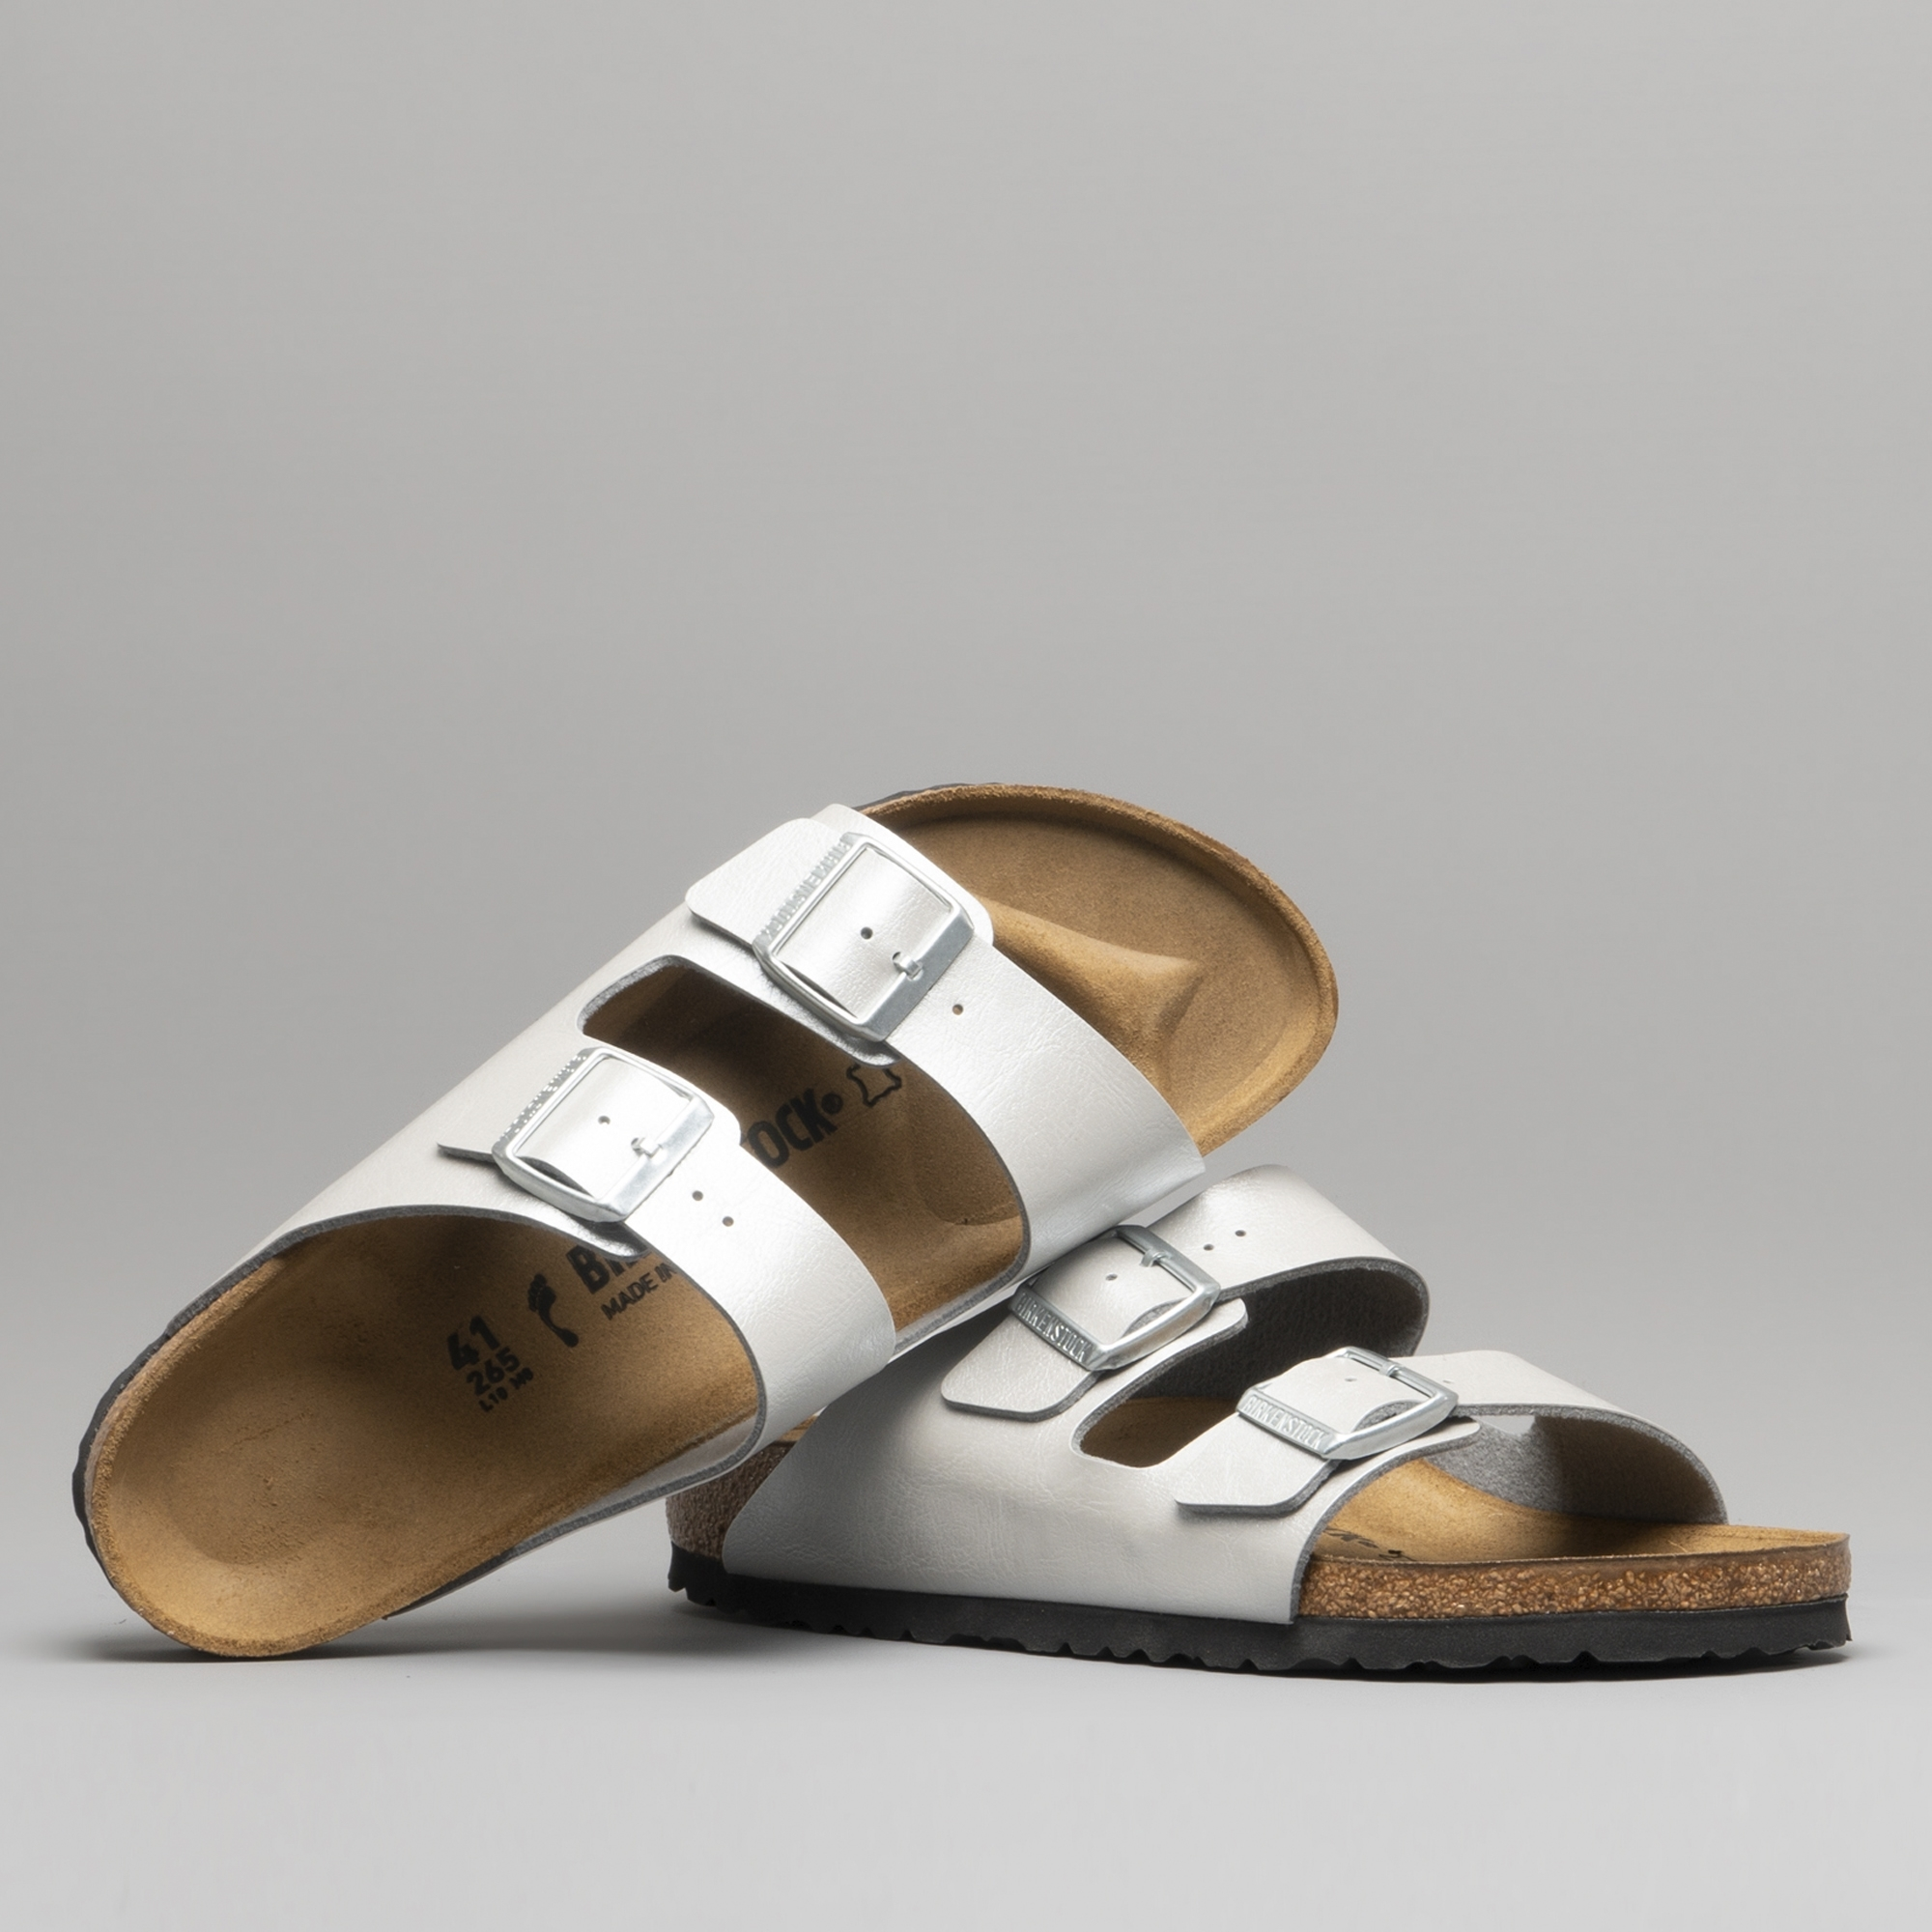 52148c39de8 Birkenstock ARIZONA 1009603 Ladies Two Strap Sandals Silver